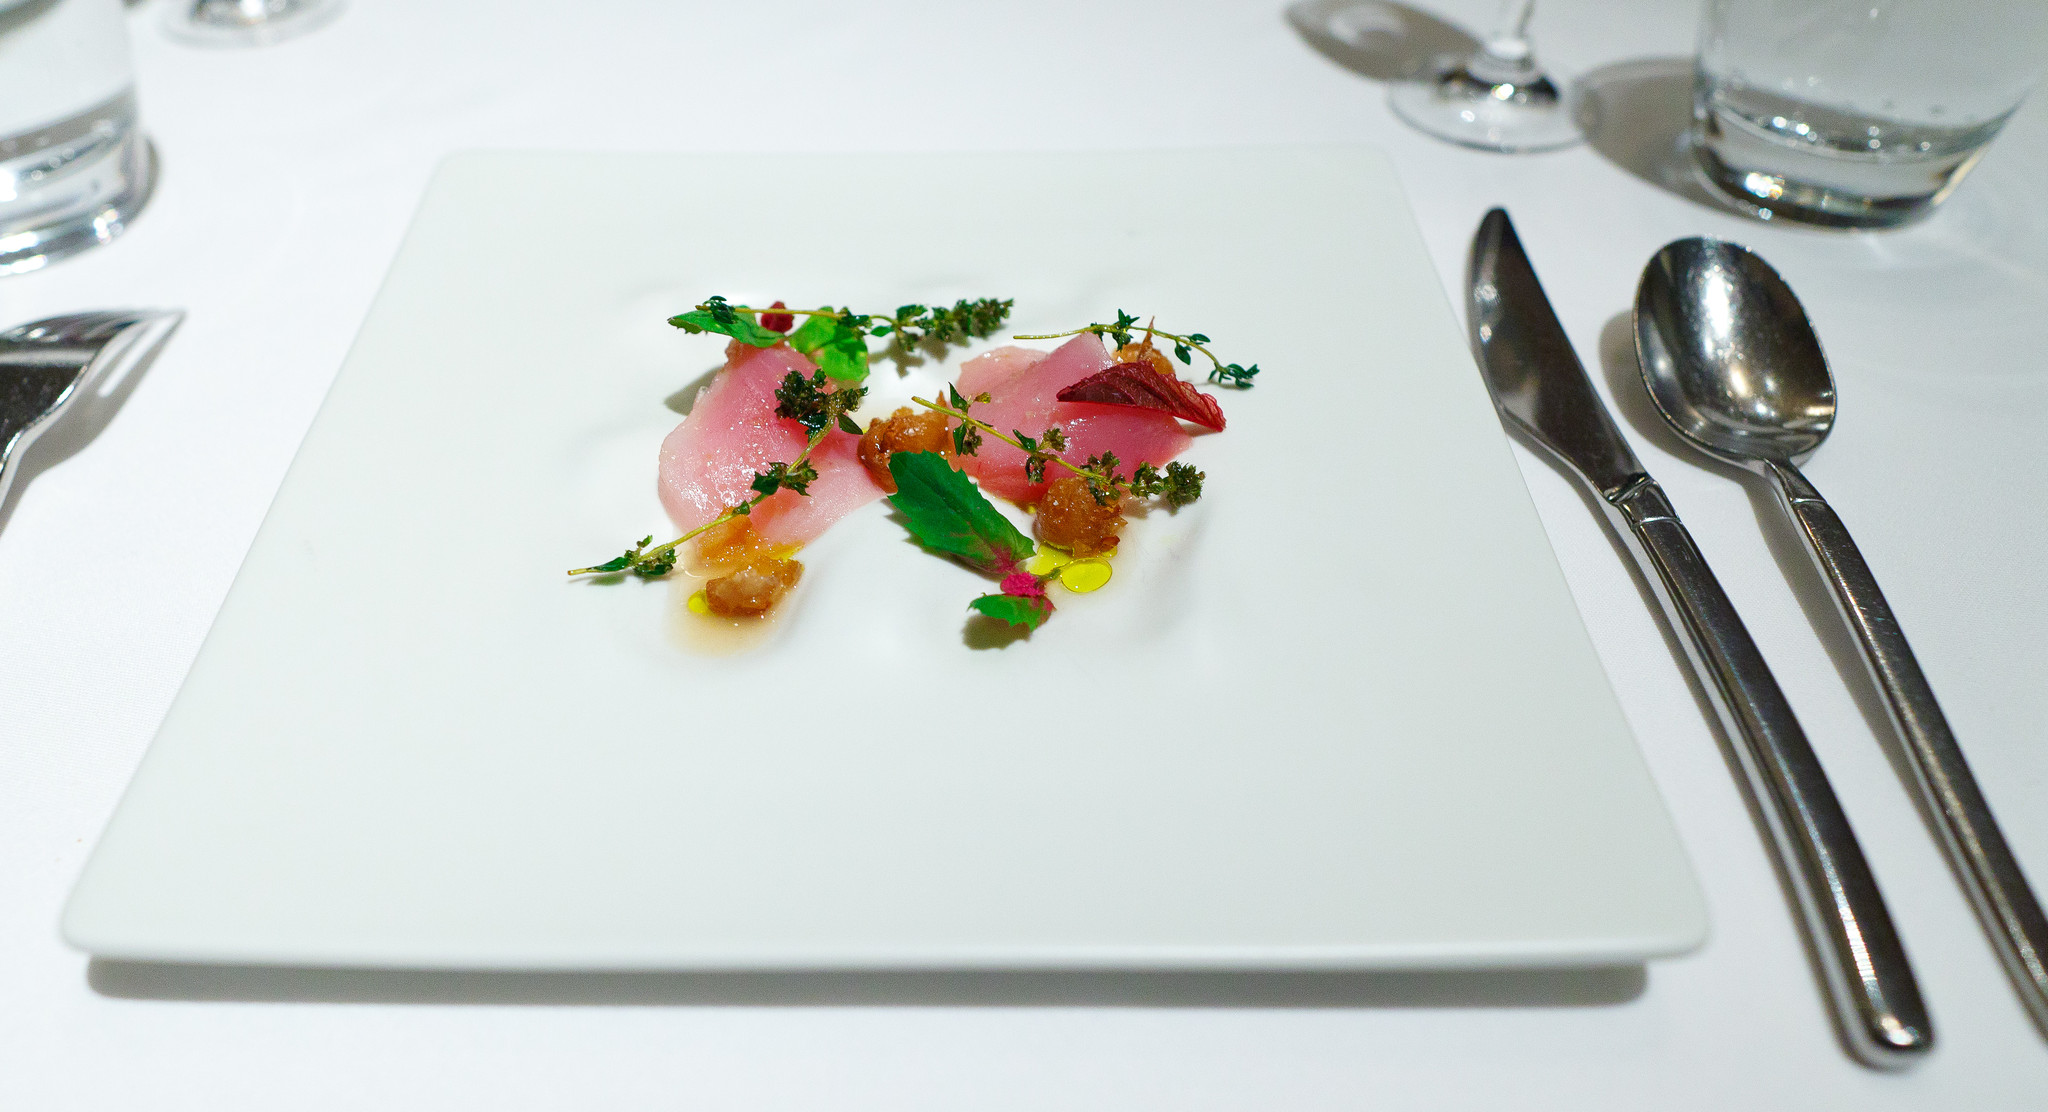 7th Course - Albacore tuna, runner beans, crispy bean shell bouillon, lemon verbena, olive oil